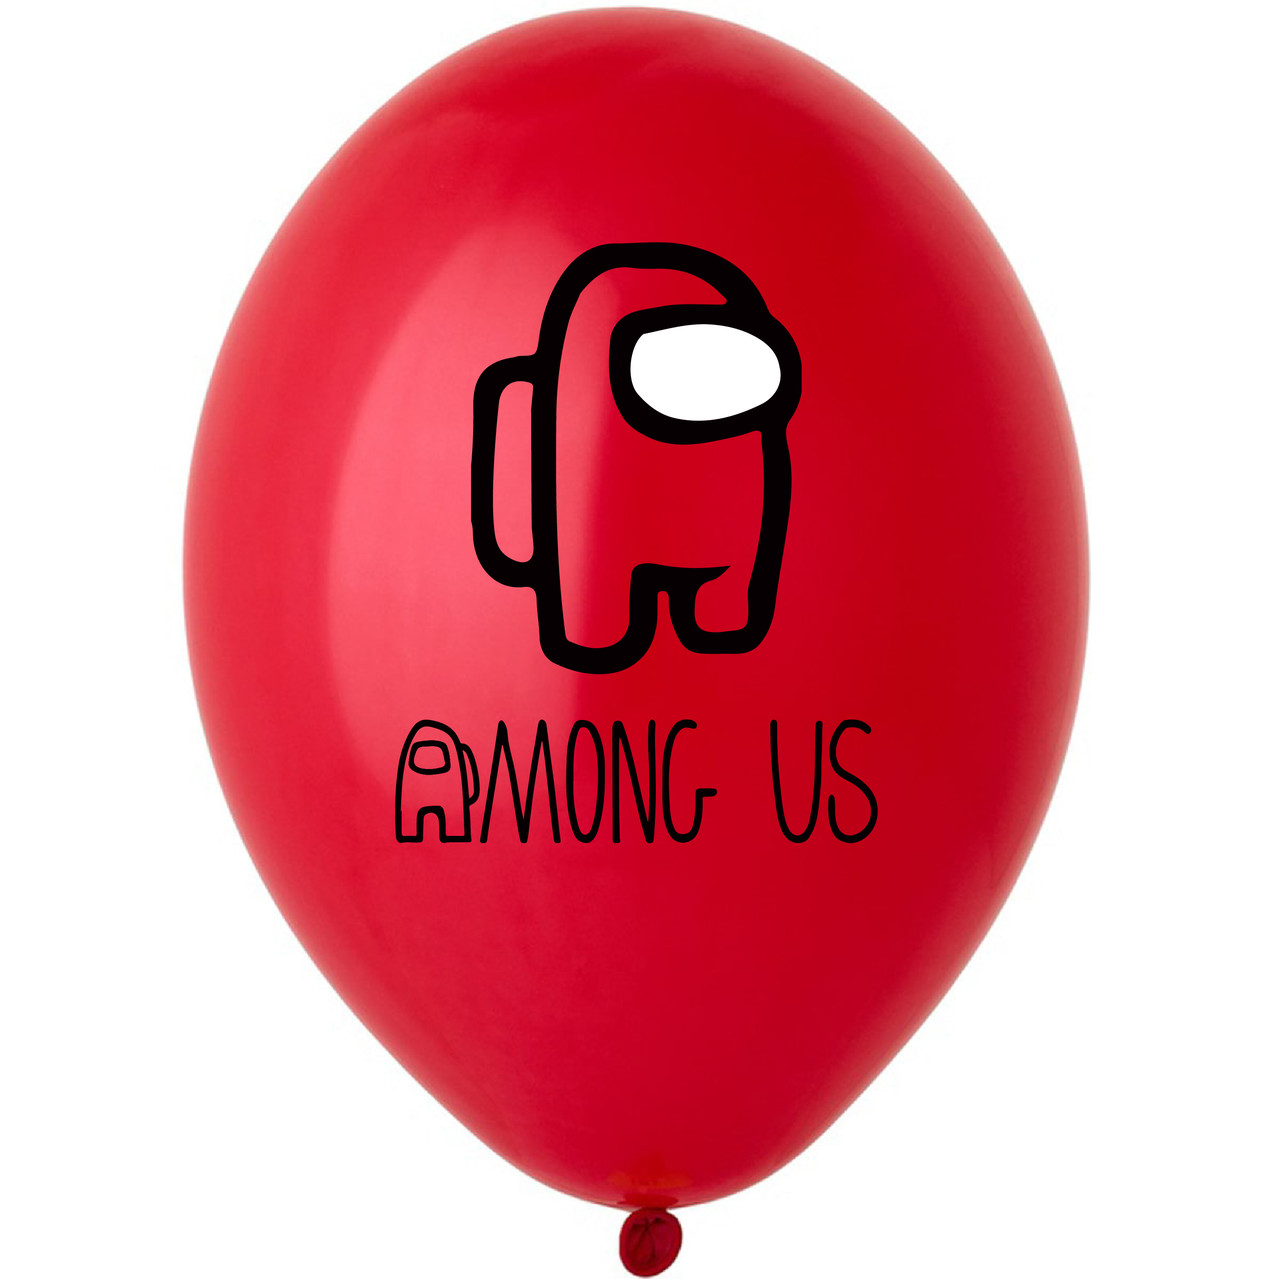 "Латексна кулька 12"" оранжева з  малюнком ""Among us"" (BelBal)"